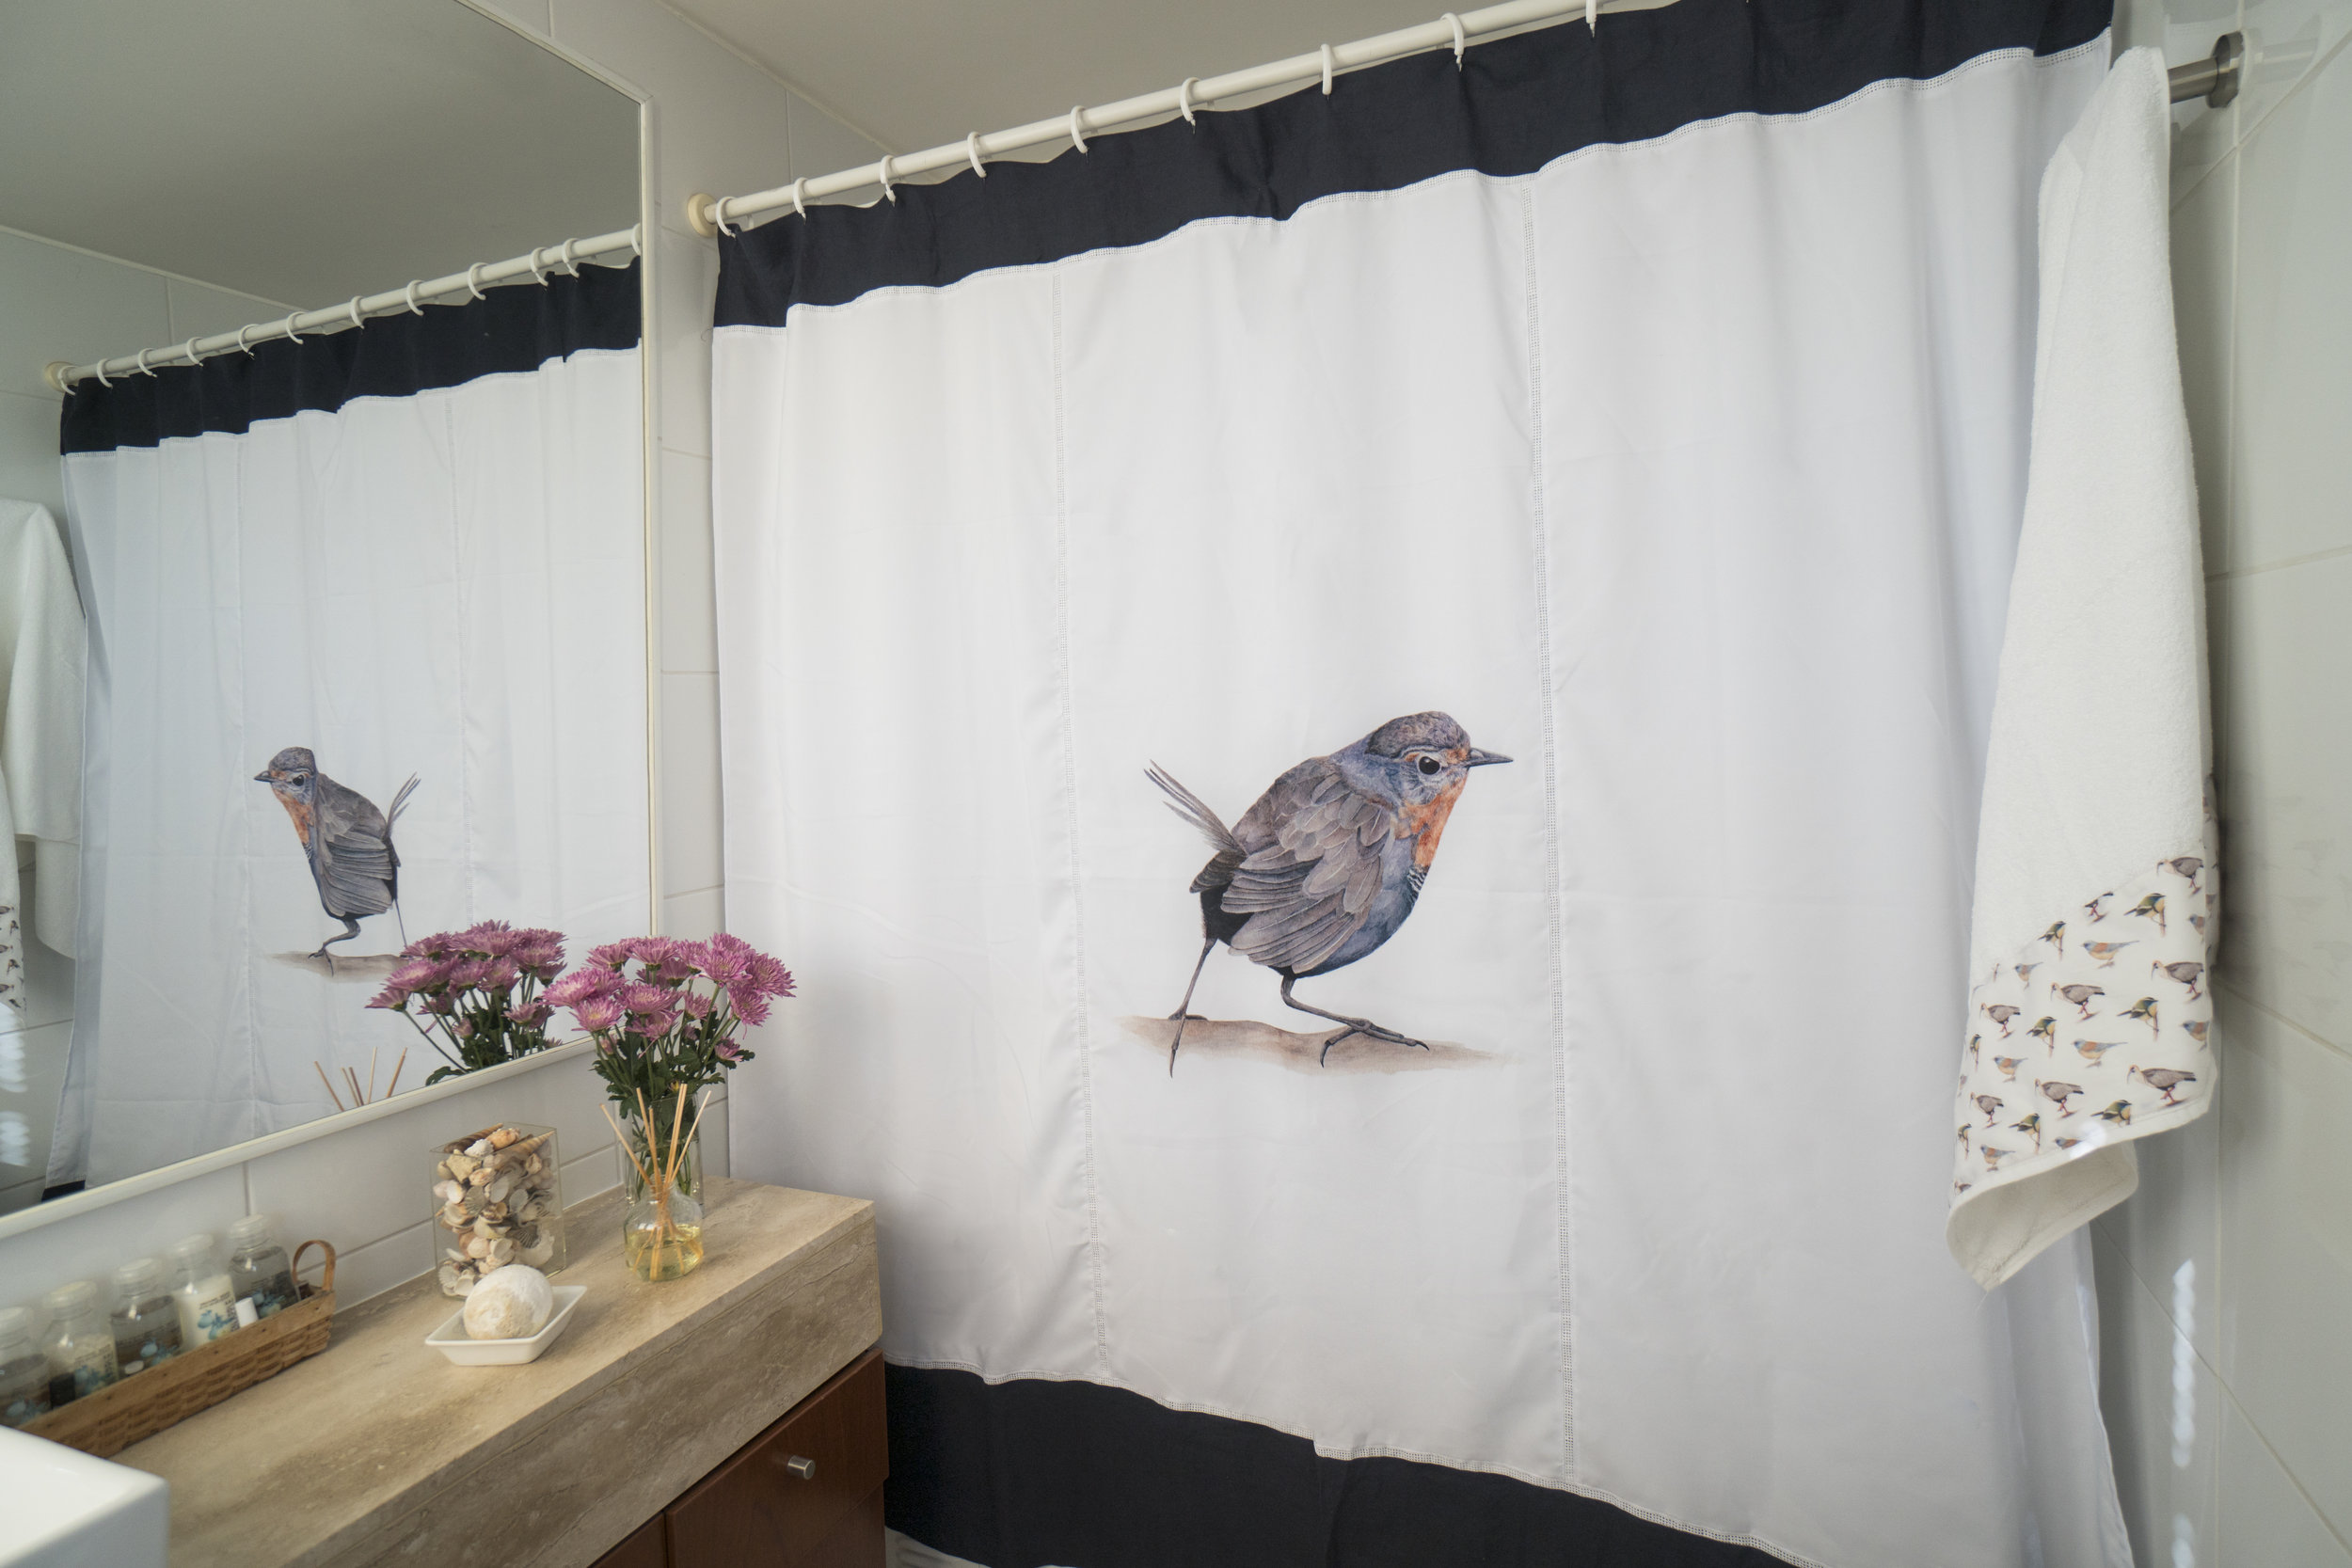 cortina chucao3.jpg